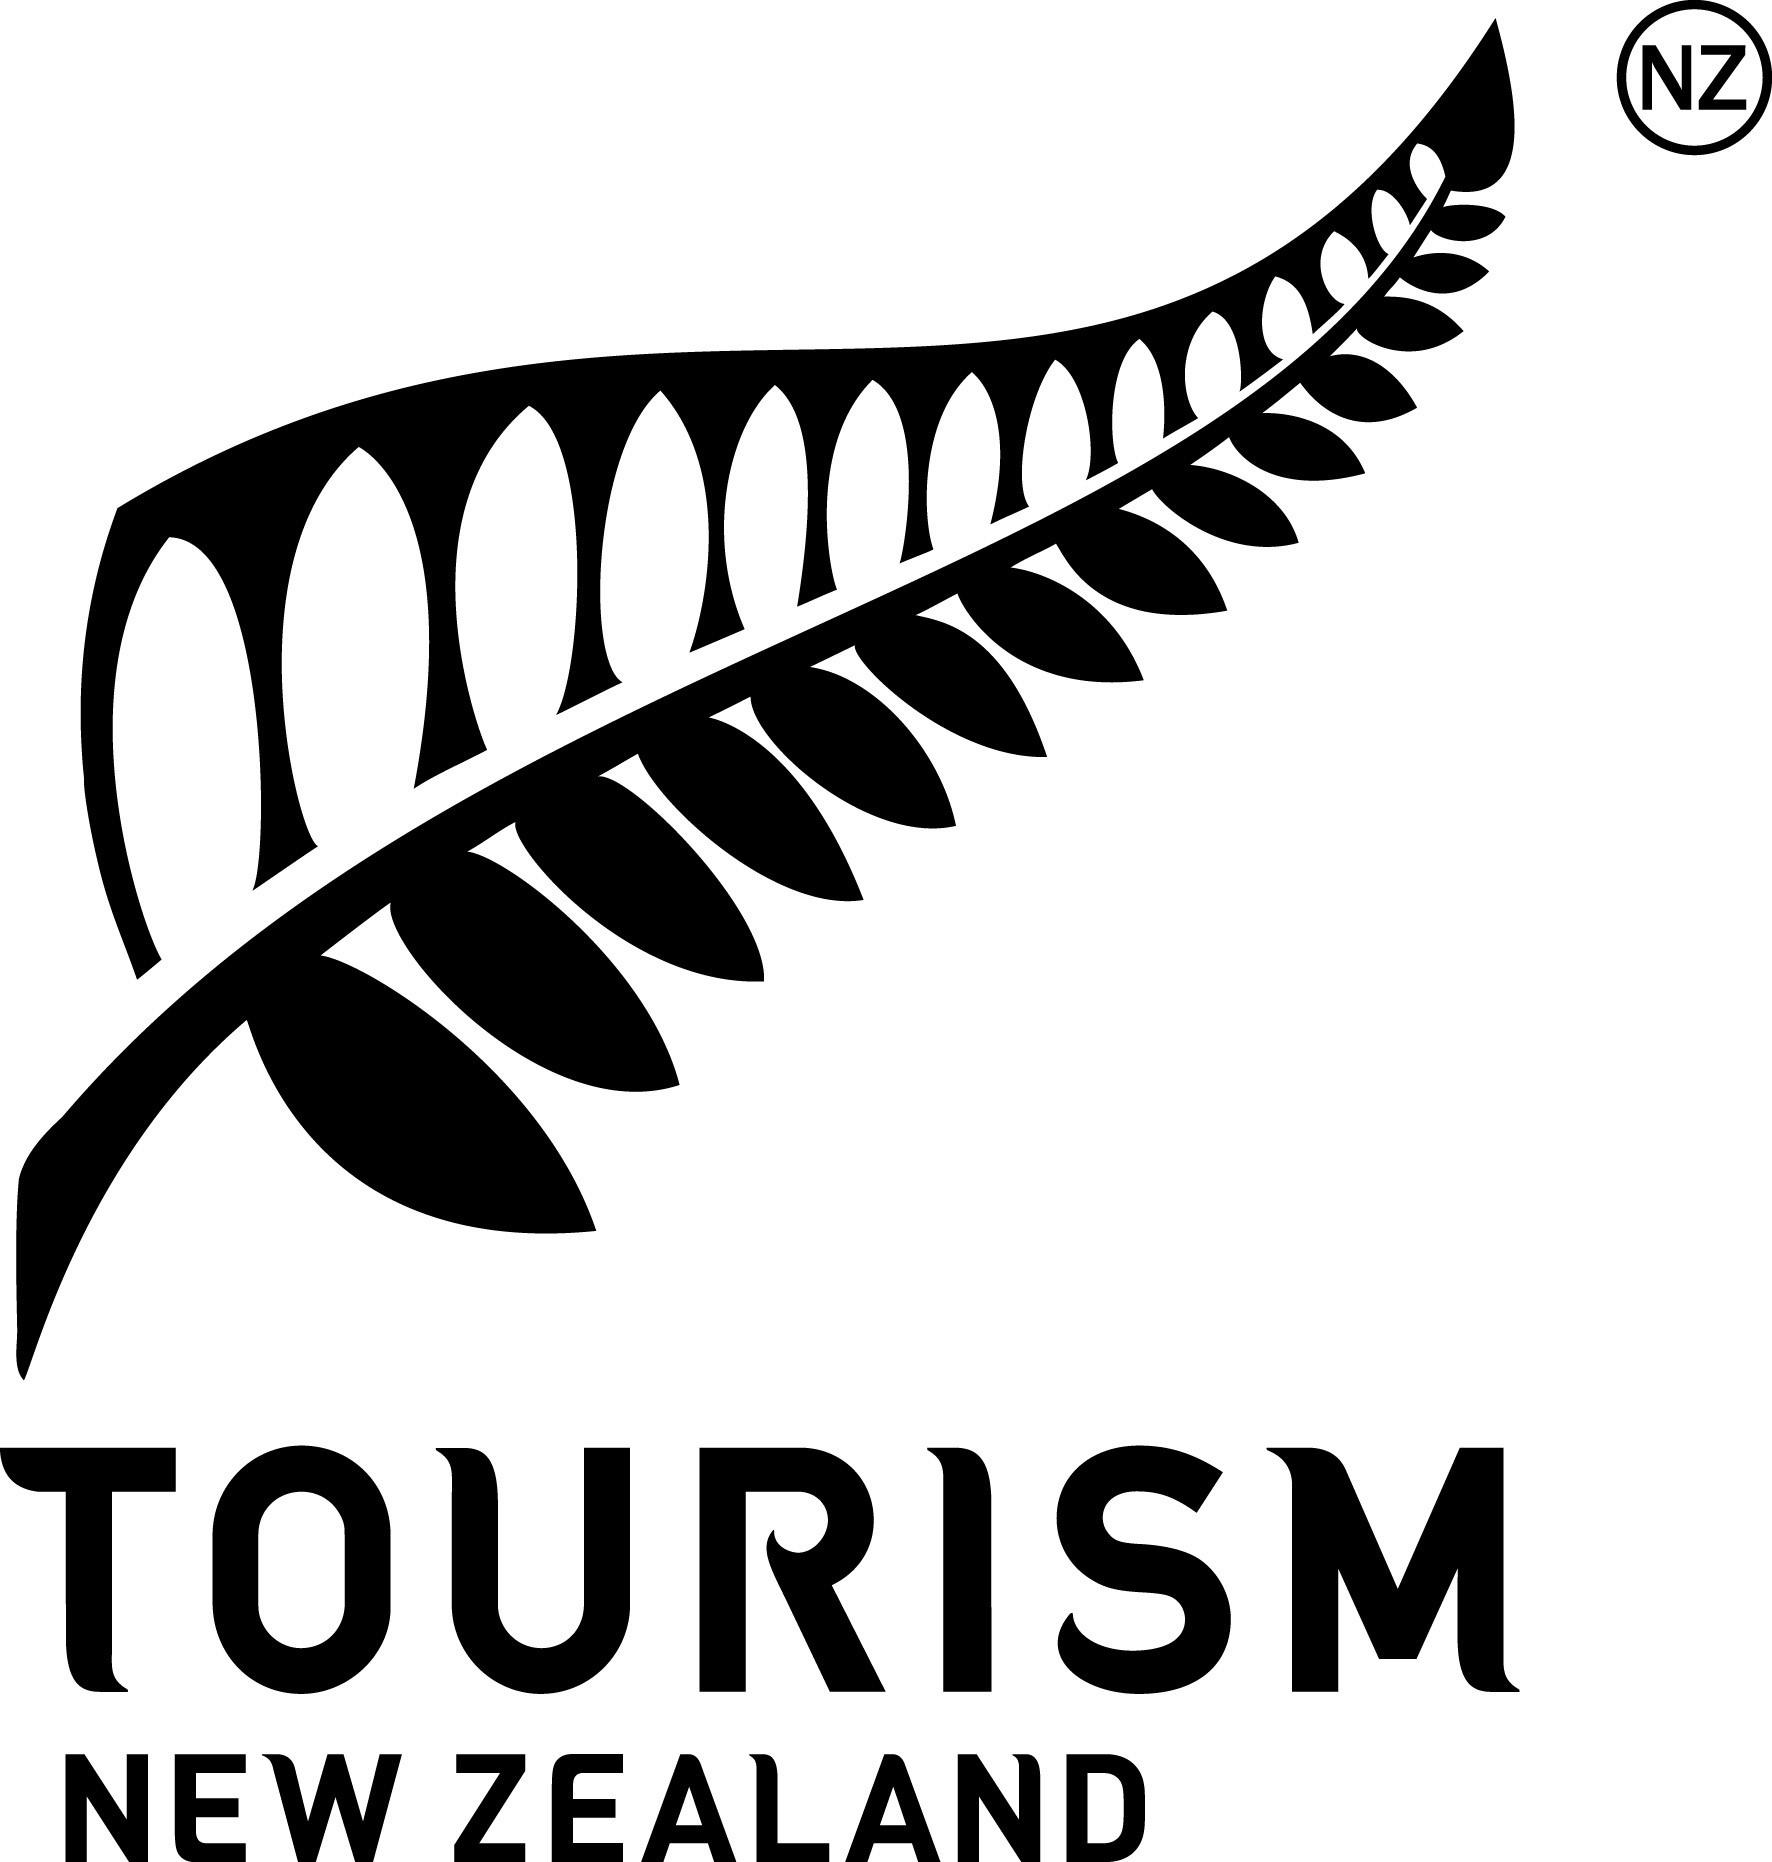 New Zealand Tourism.jpg